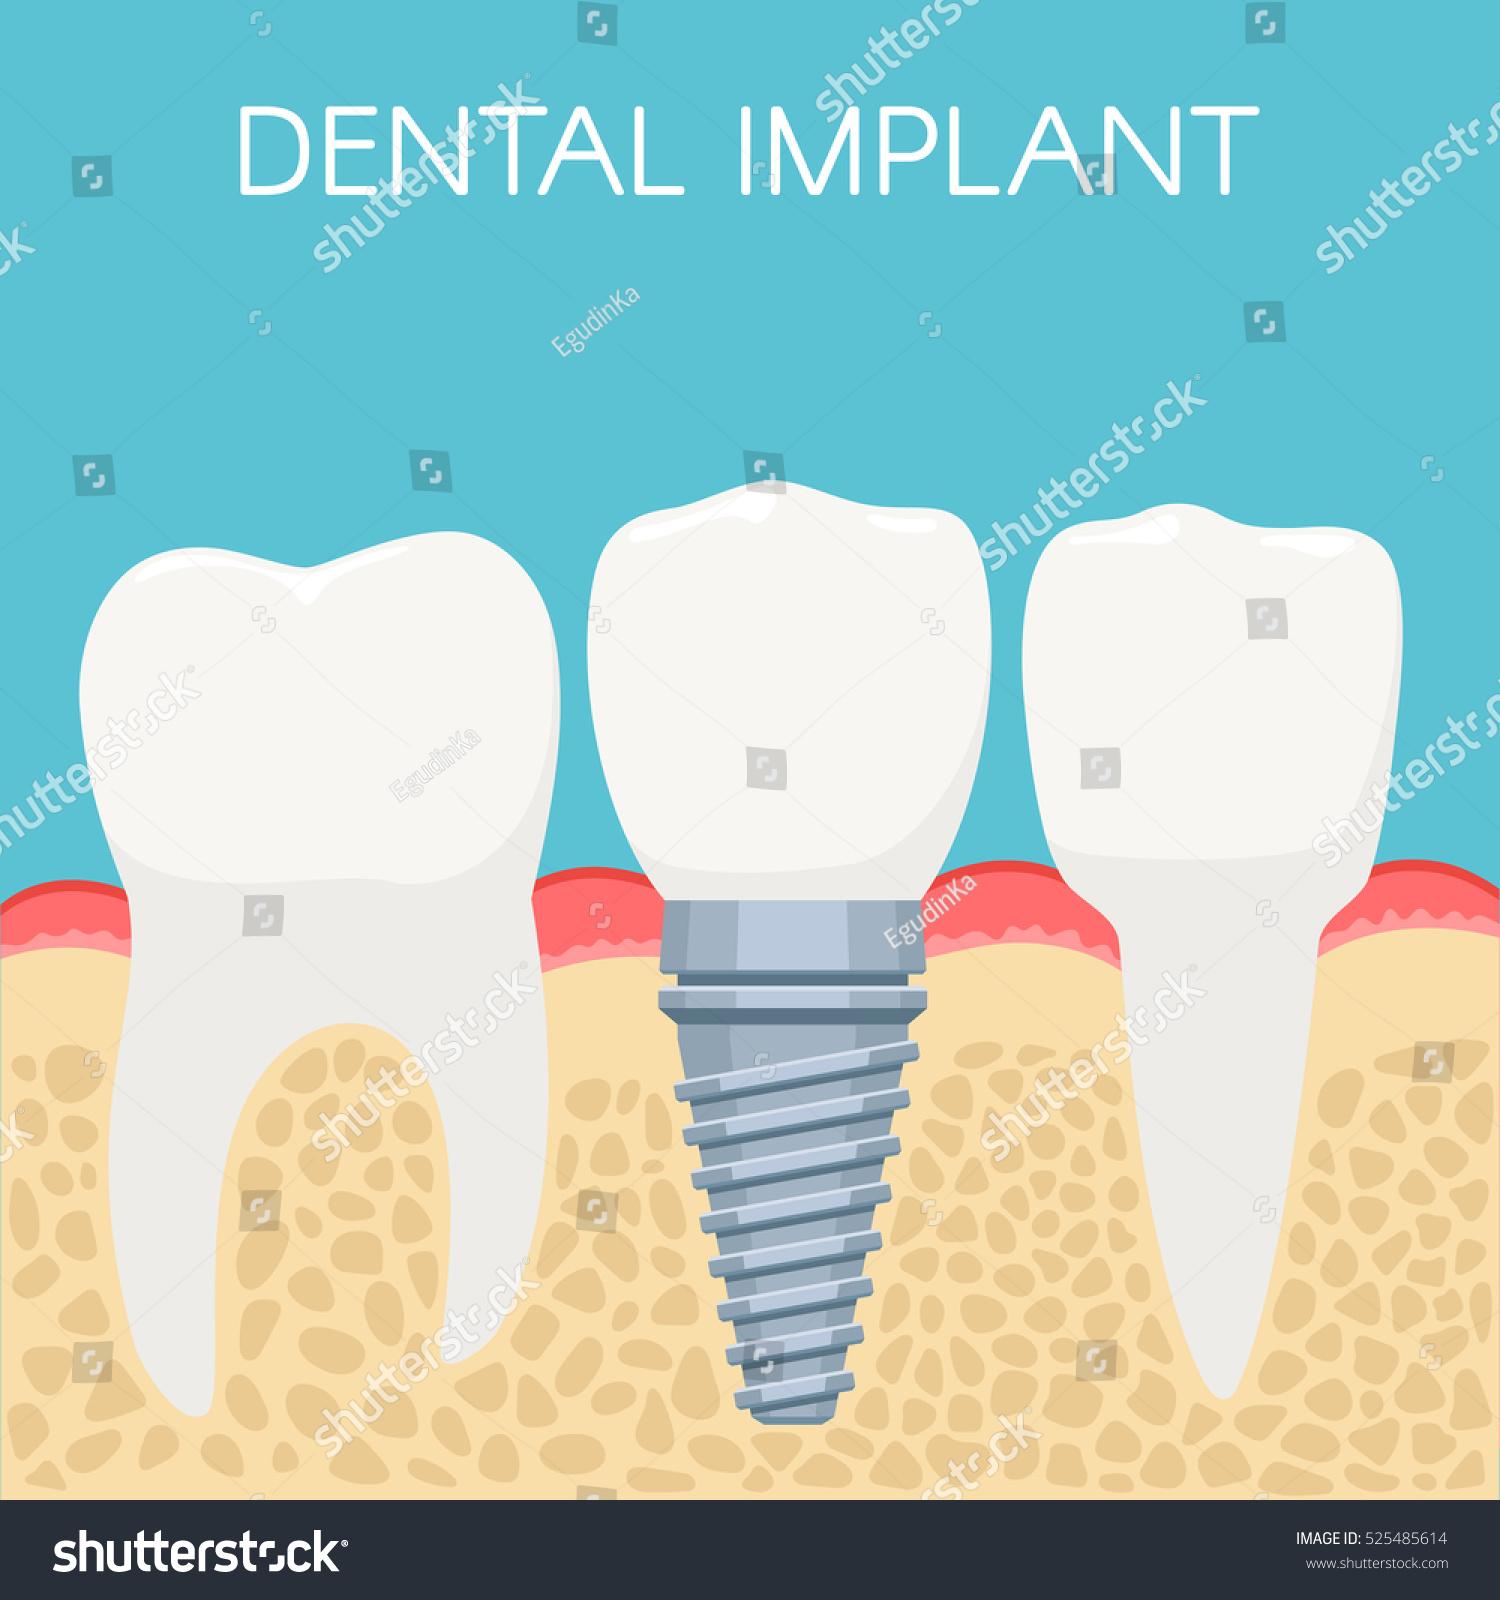 Anatomy Human Teeth Dental Implant Stomatology Stock Vector HD ...